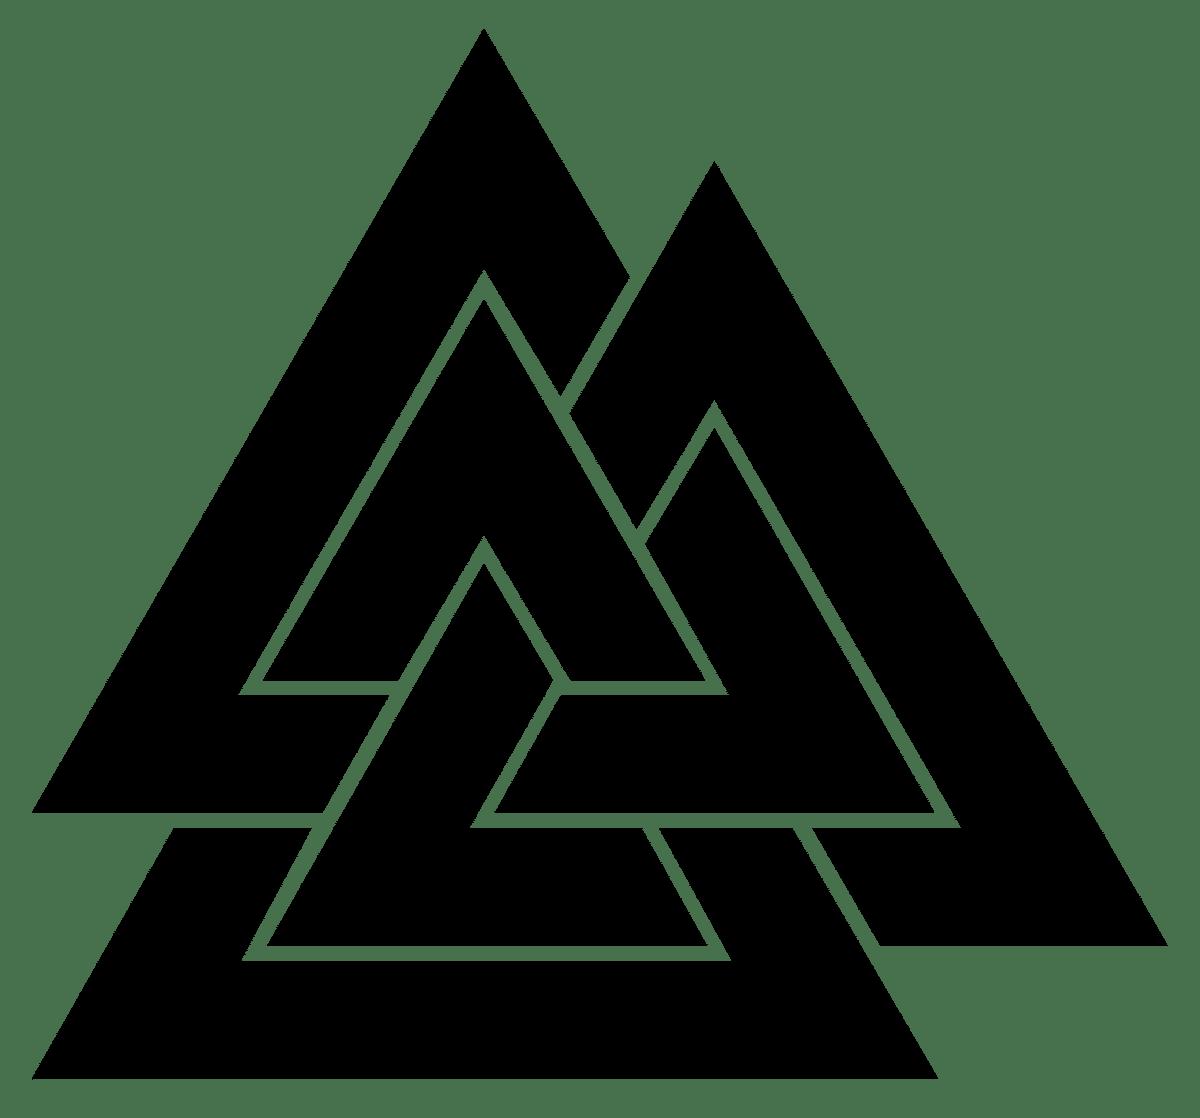 Символа валькнут: значение и описание оберега (фото)